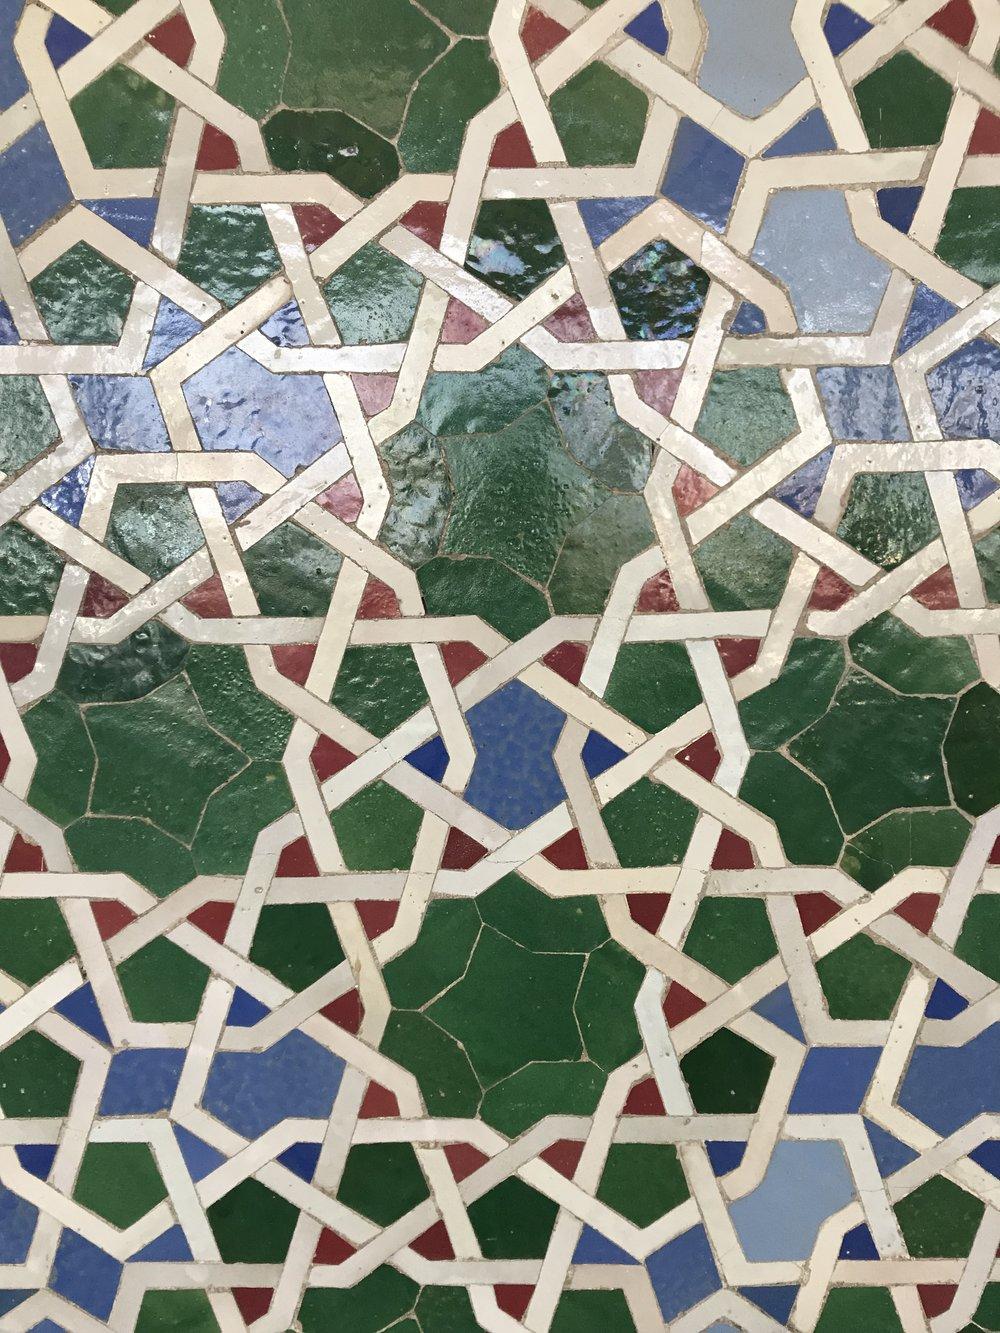 casablanca airport tile.JPG